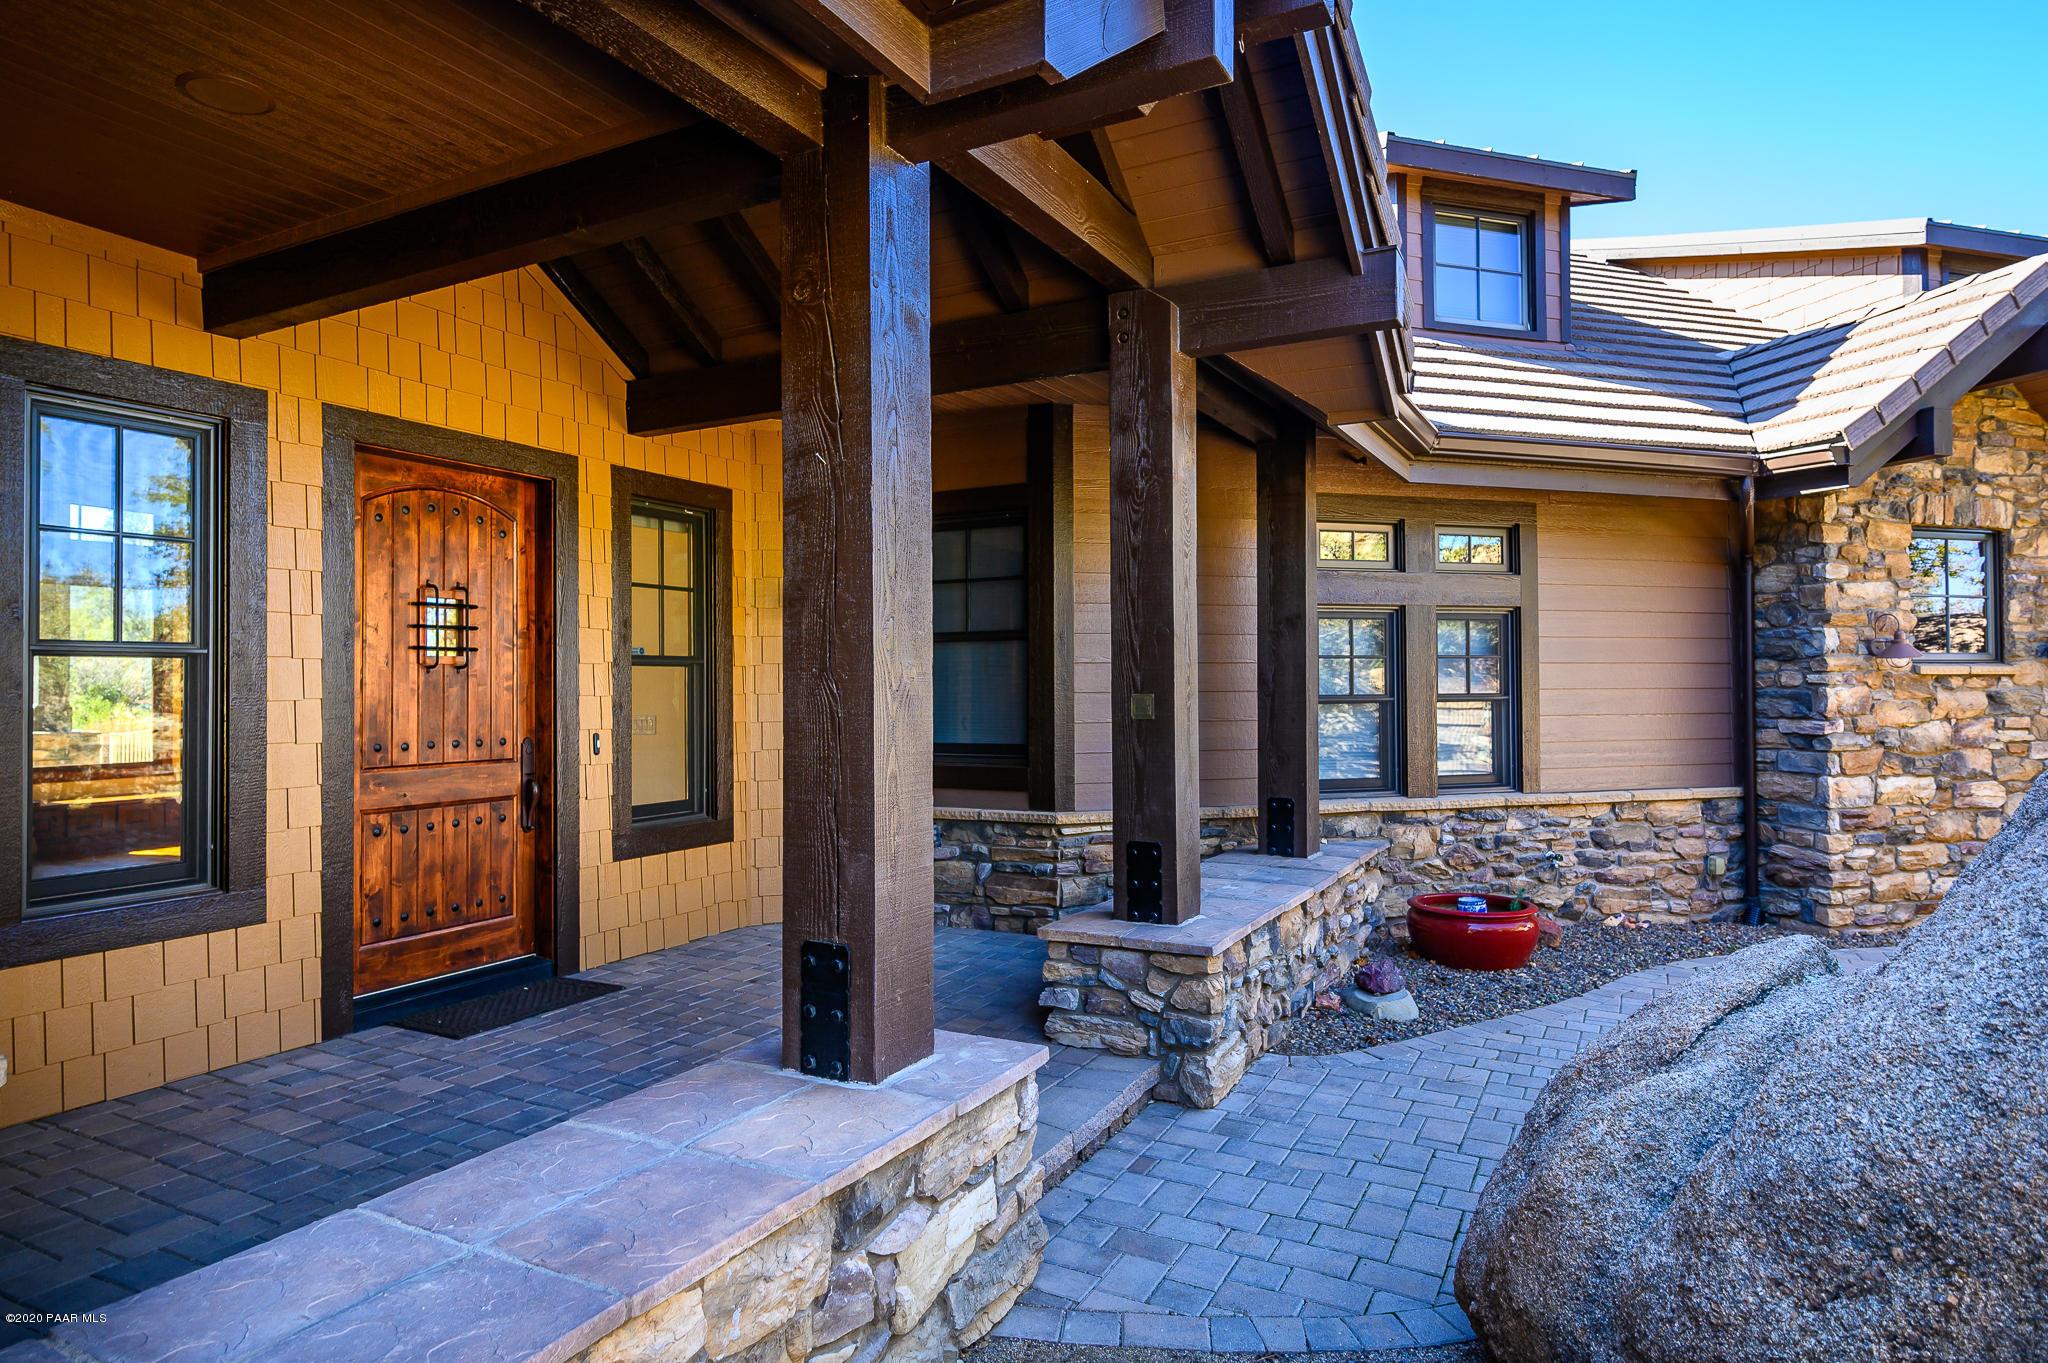 Photo of 9640 American Ranch, Prescott, AZ 86305